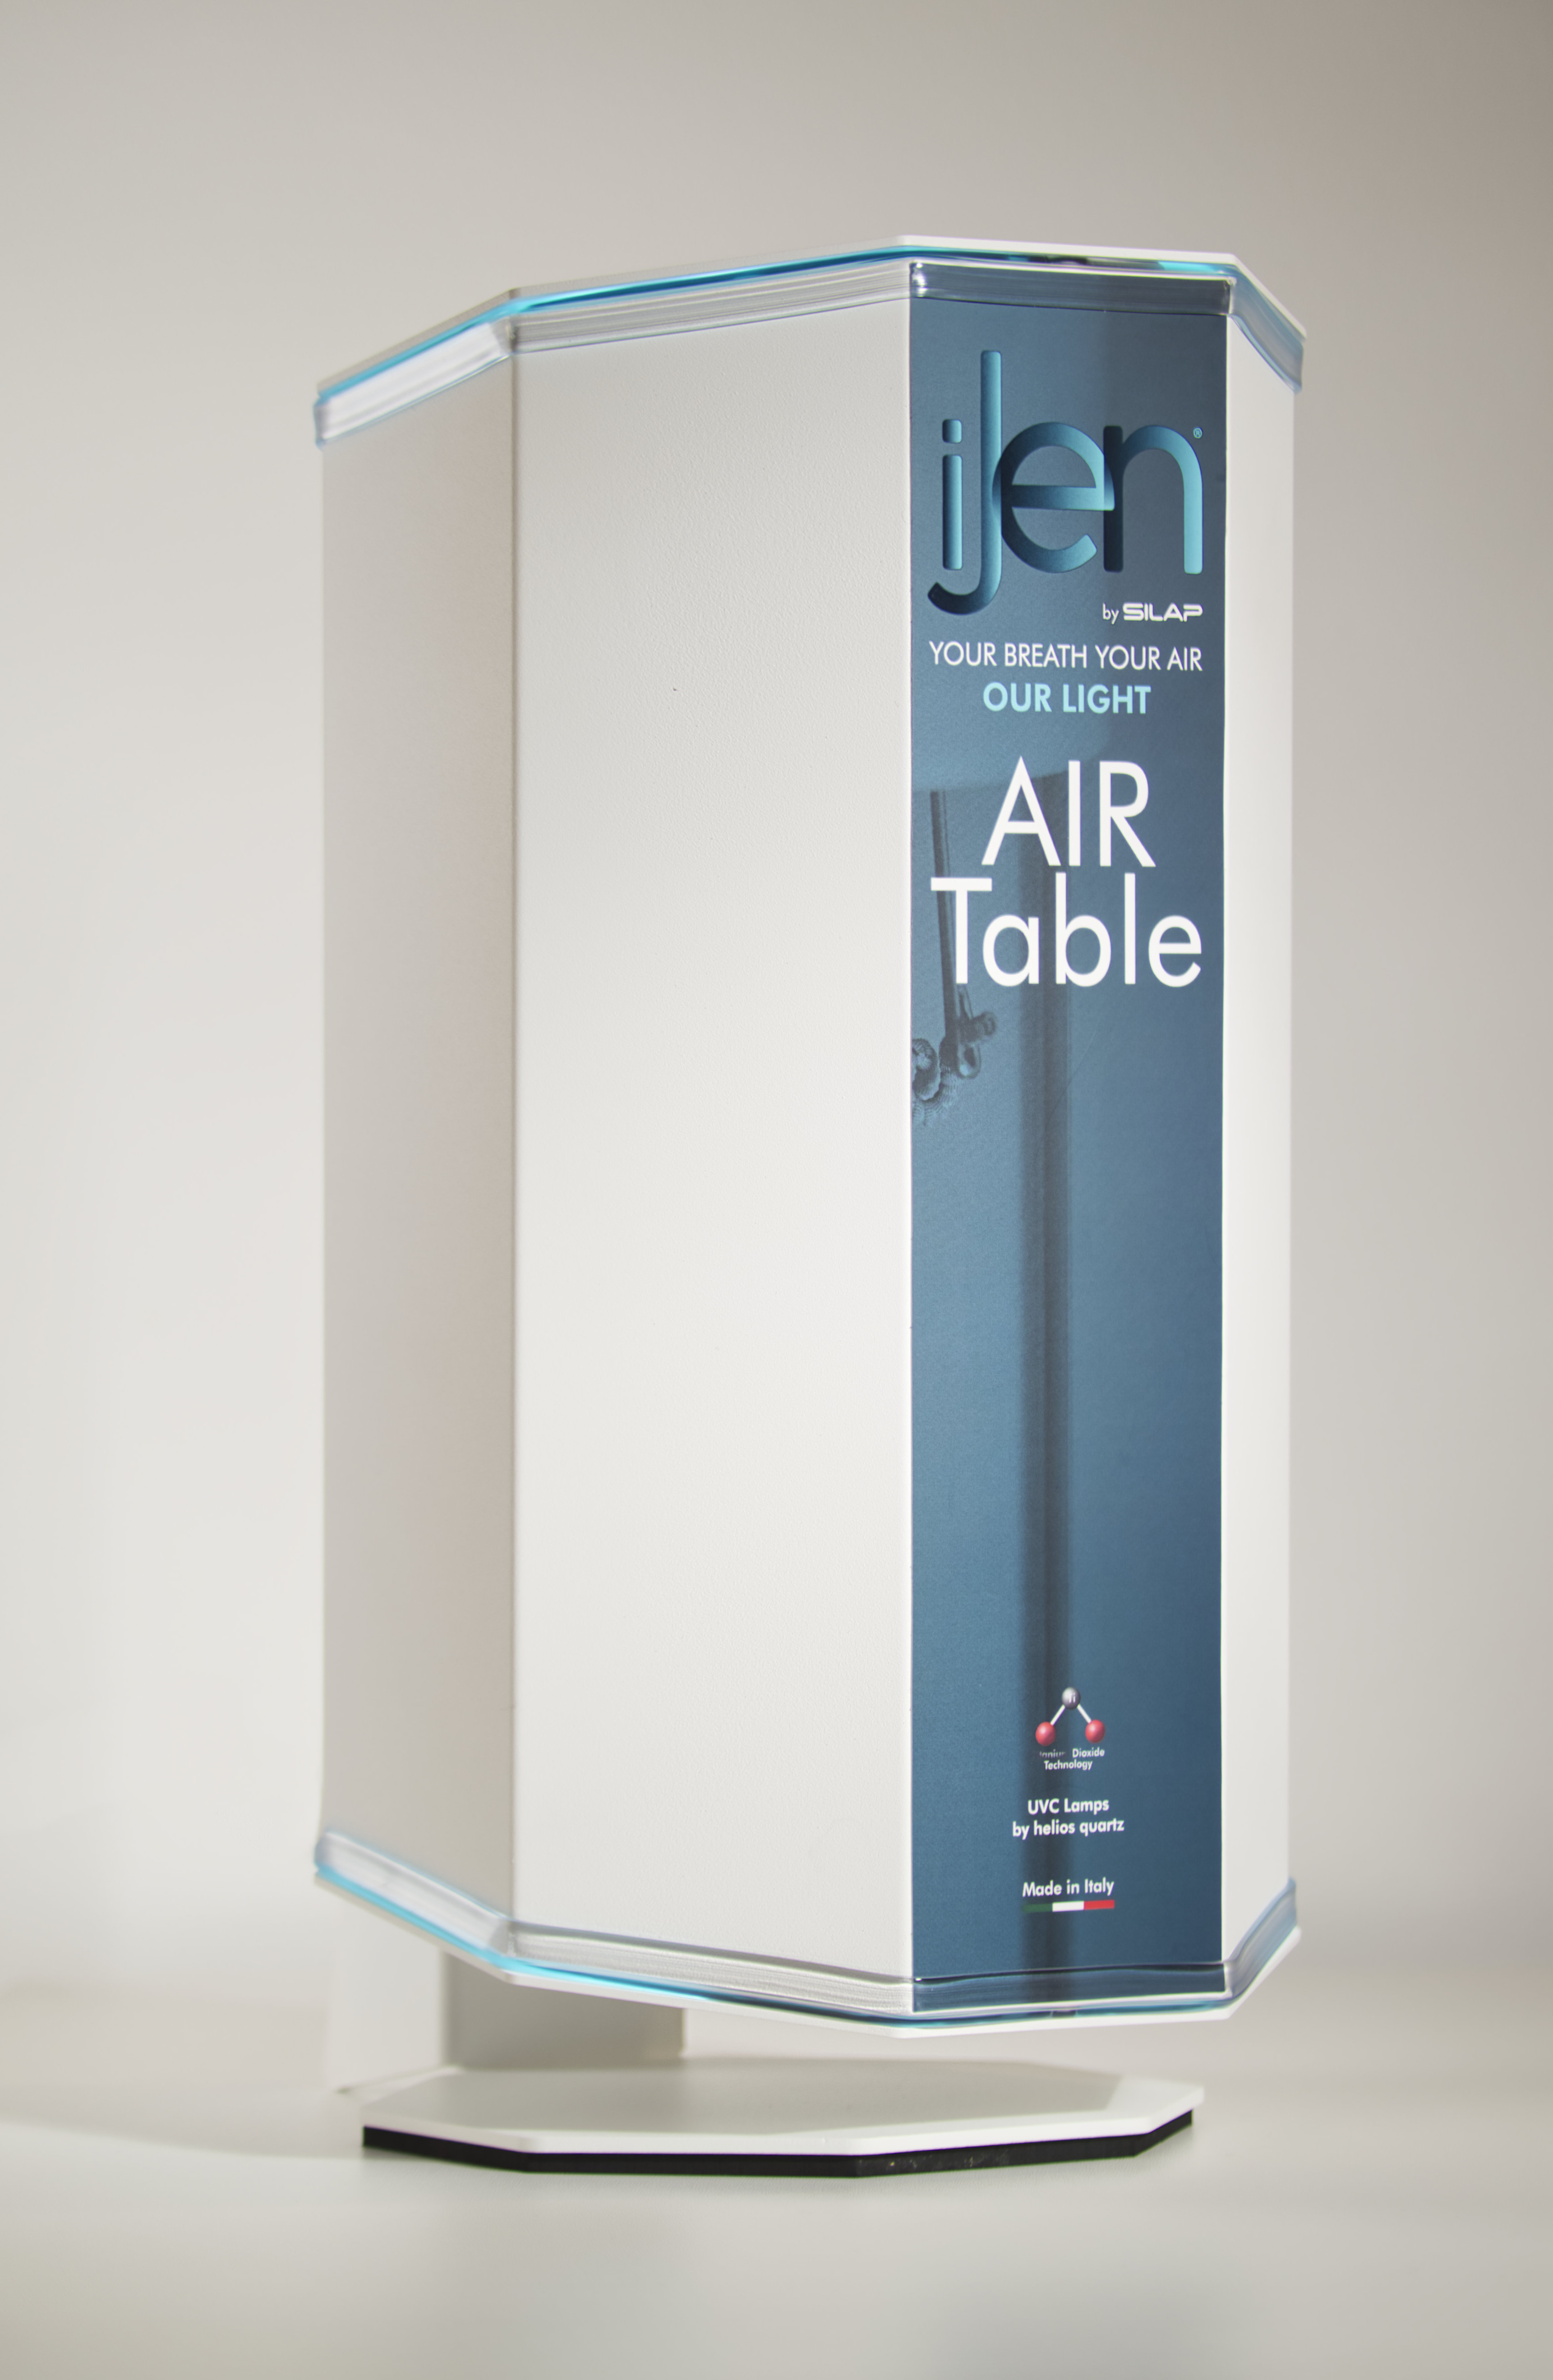 iJen AIR Table 03